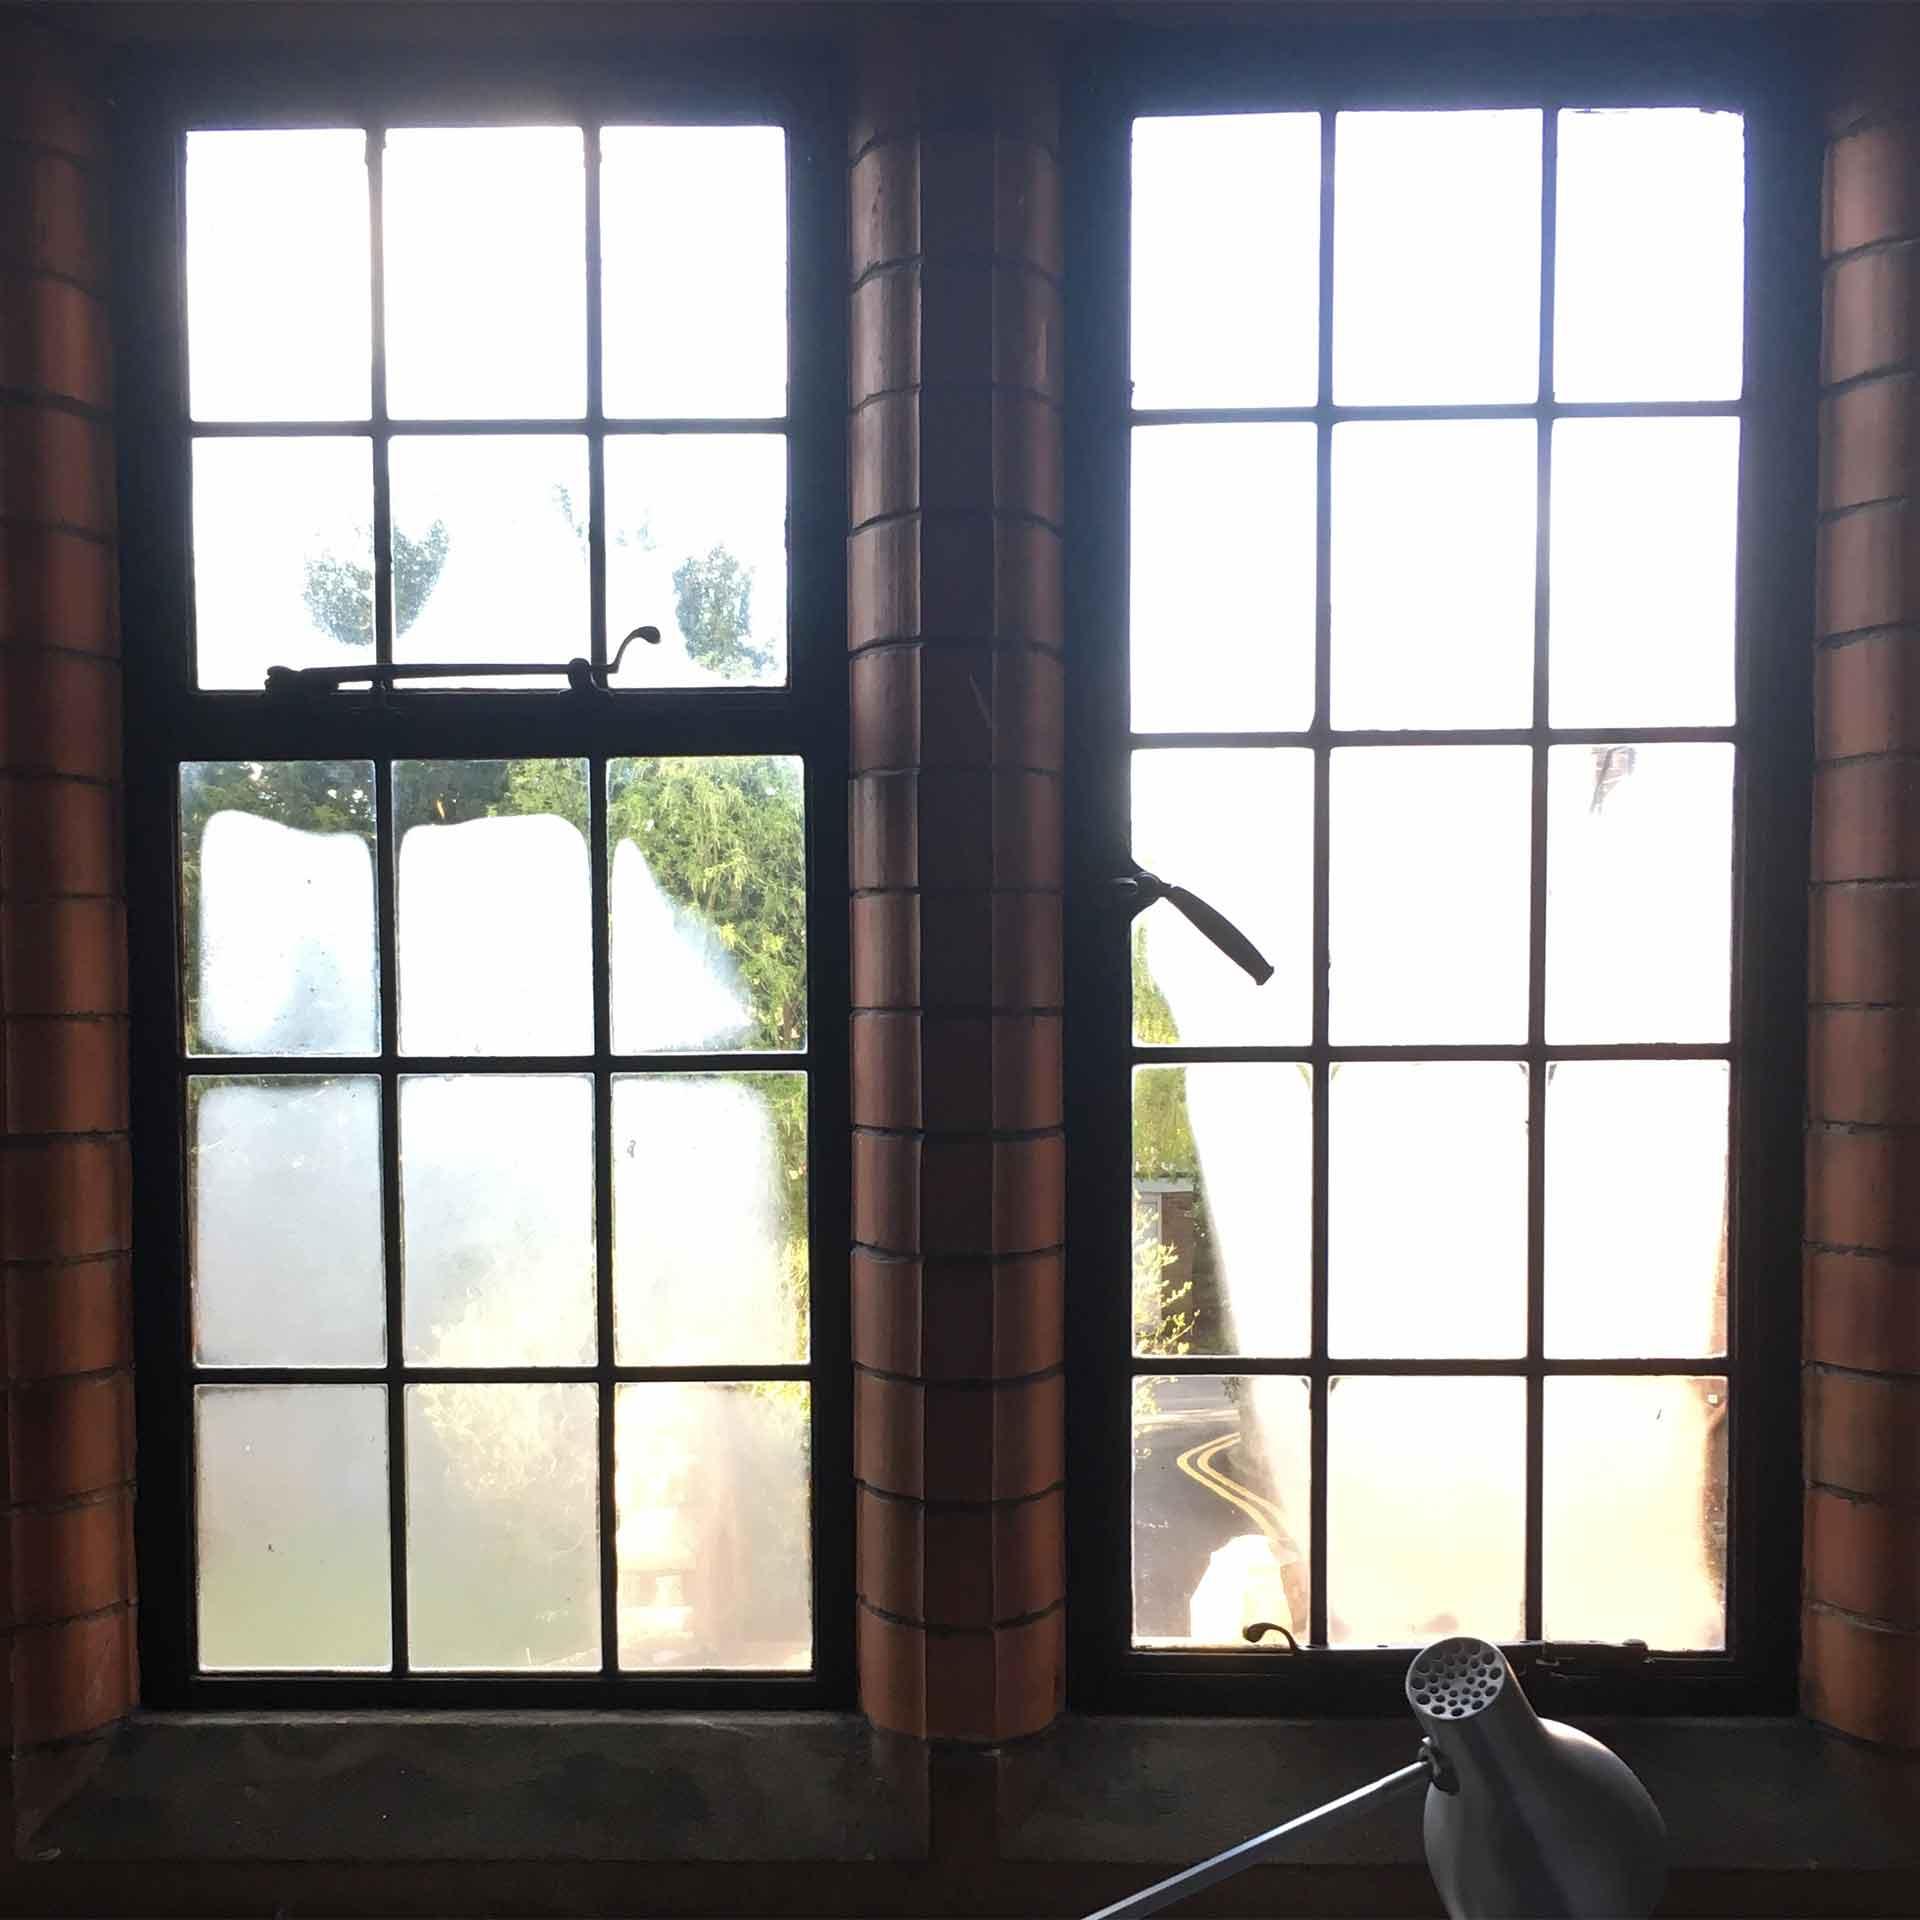 Gladstone's window